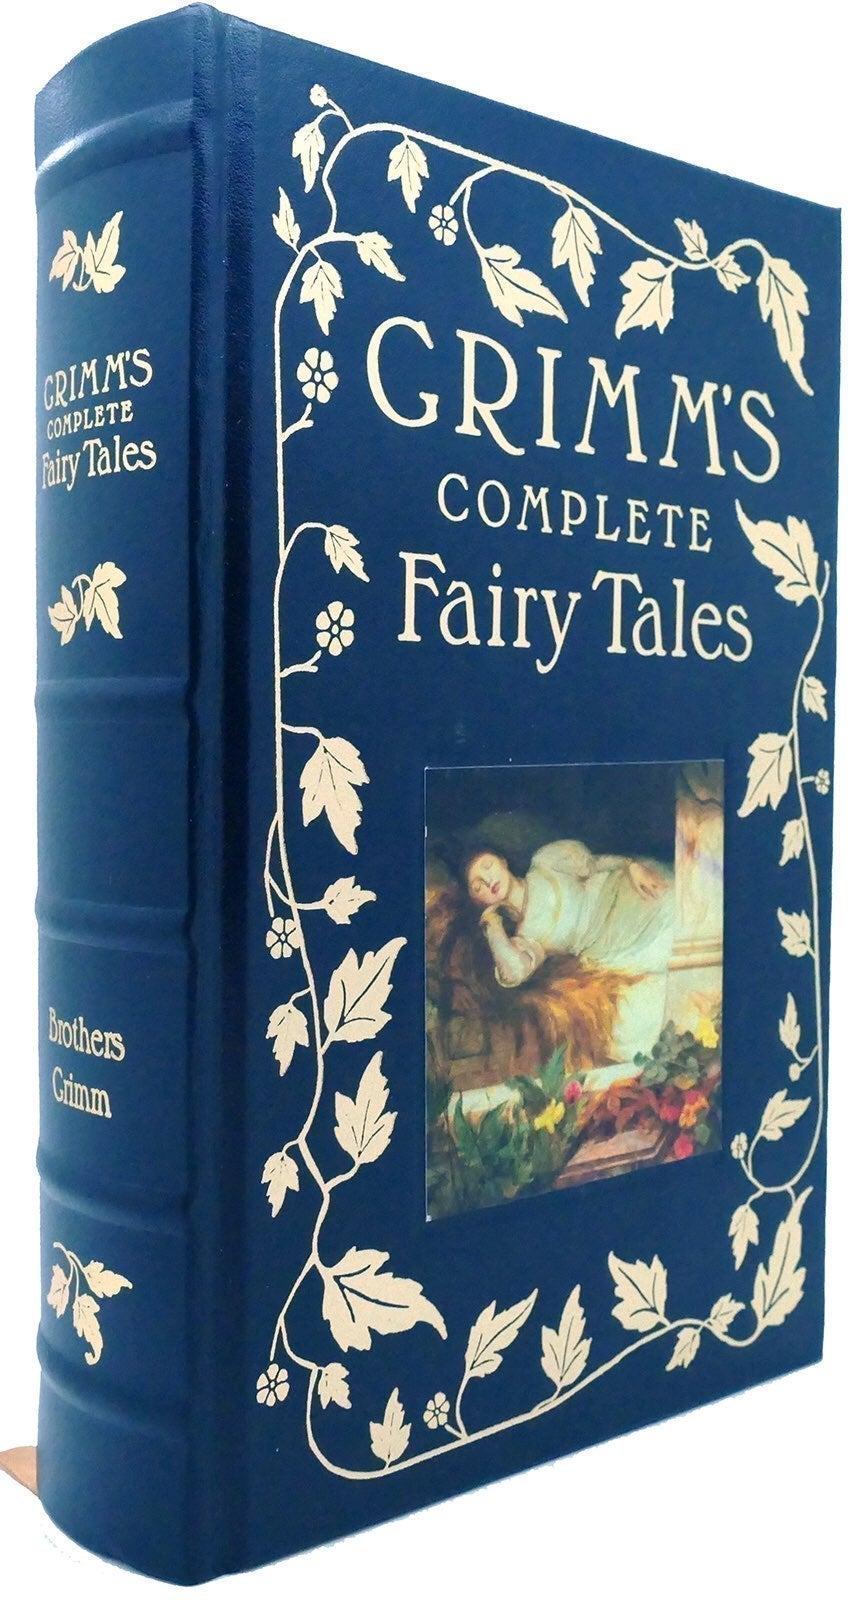 Vintage Grimm's Complete Fairy Tales